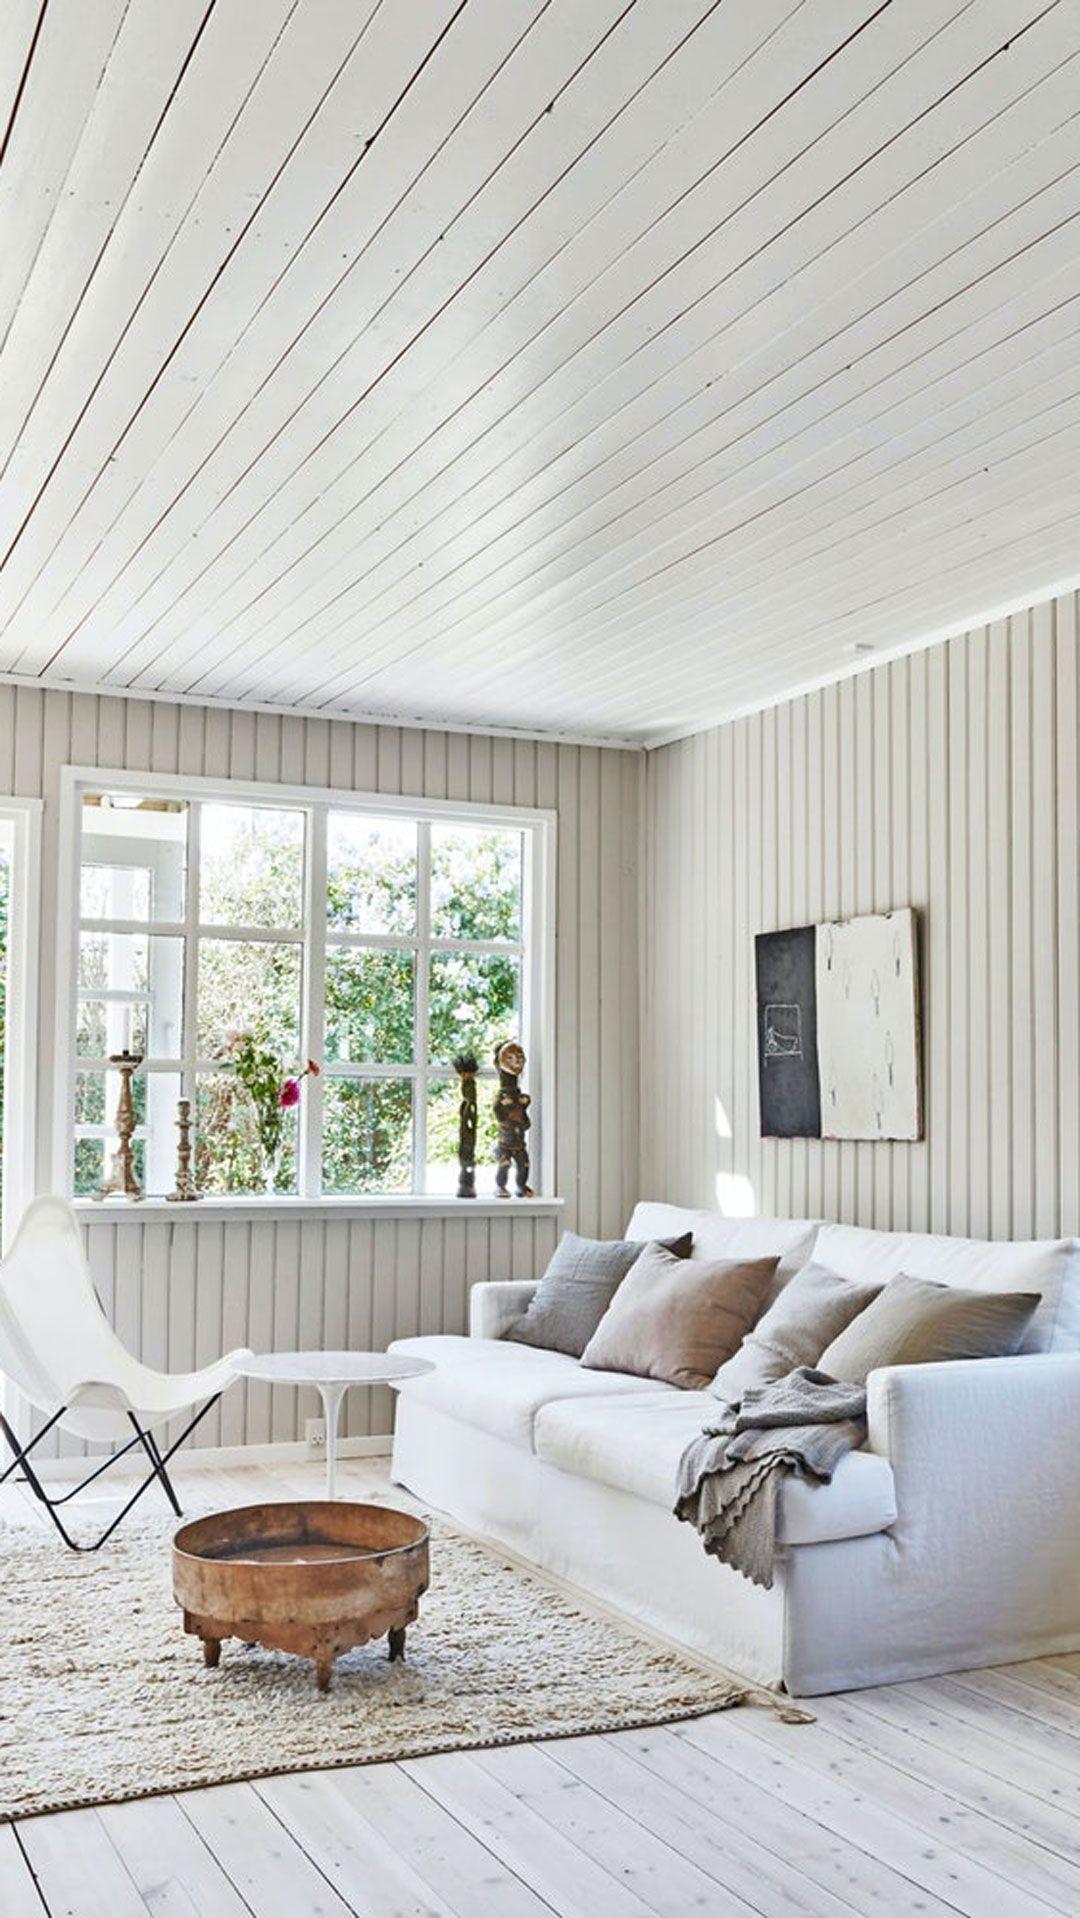 A living room with big windows. #Livingroom #Light #Whitecouch #Simple